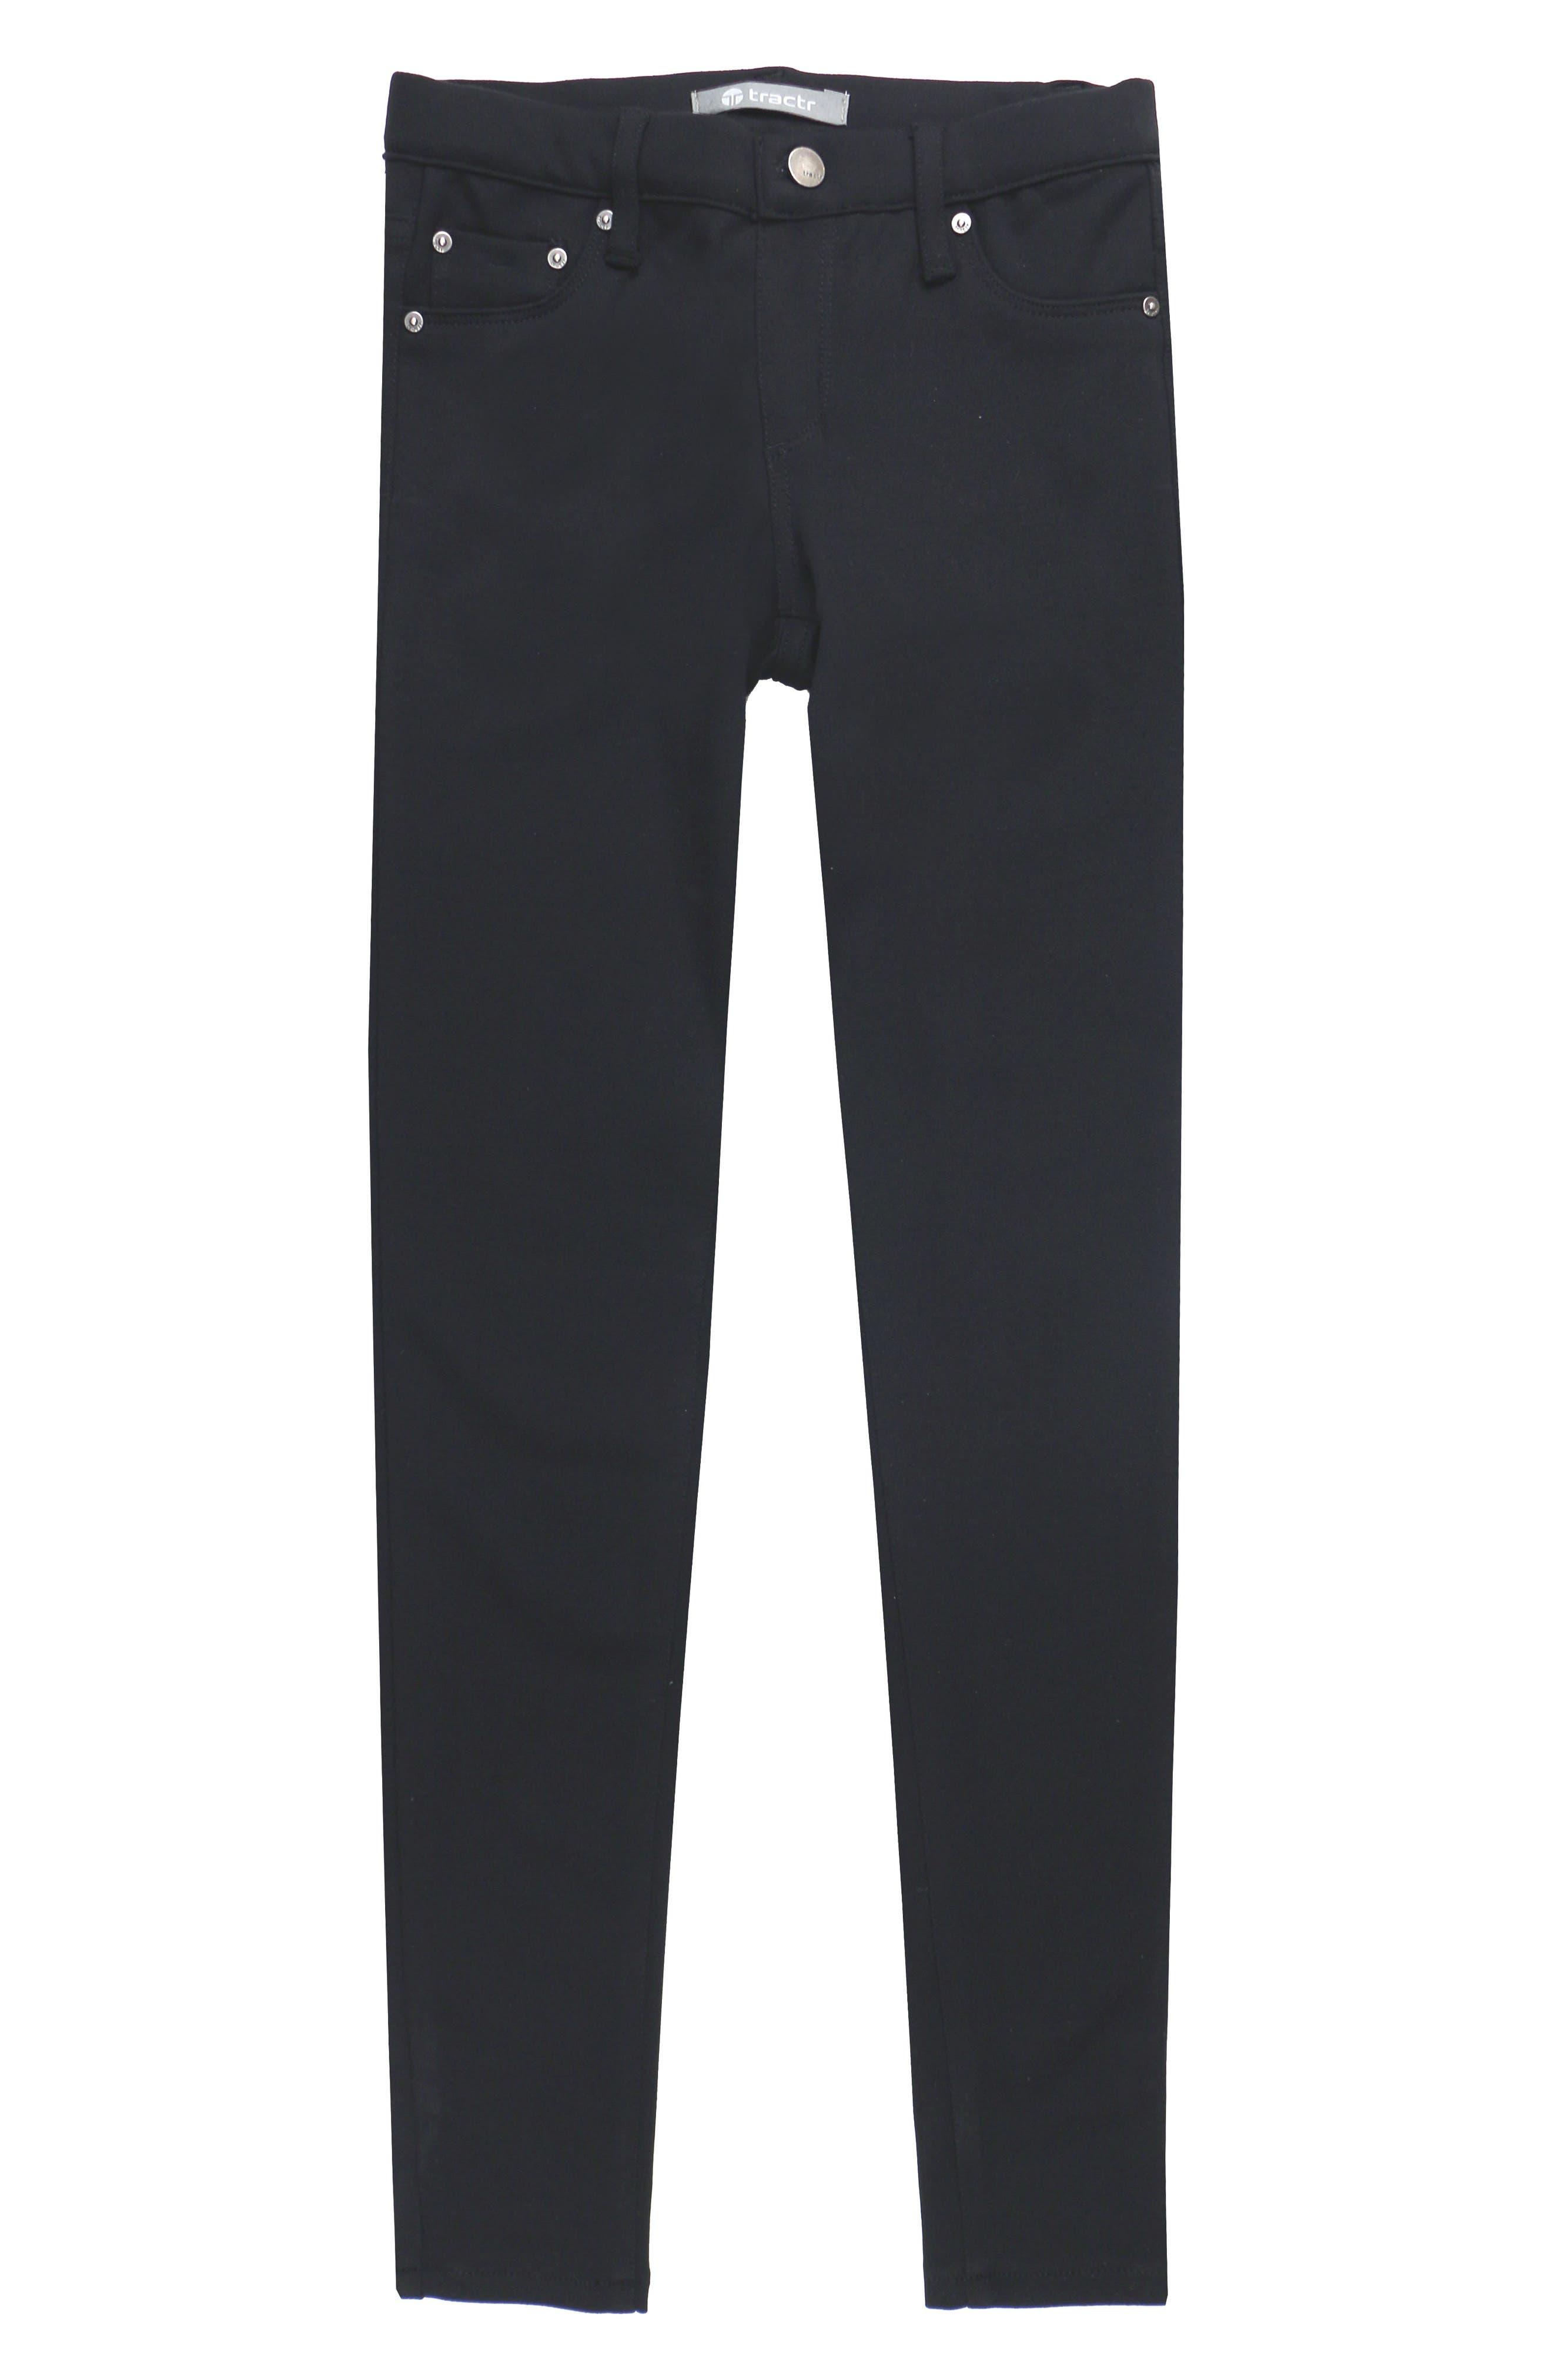 Ponte Knit Skinny Jeans,                             Main thumbnail 1, color,                             BLACK